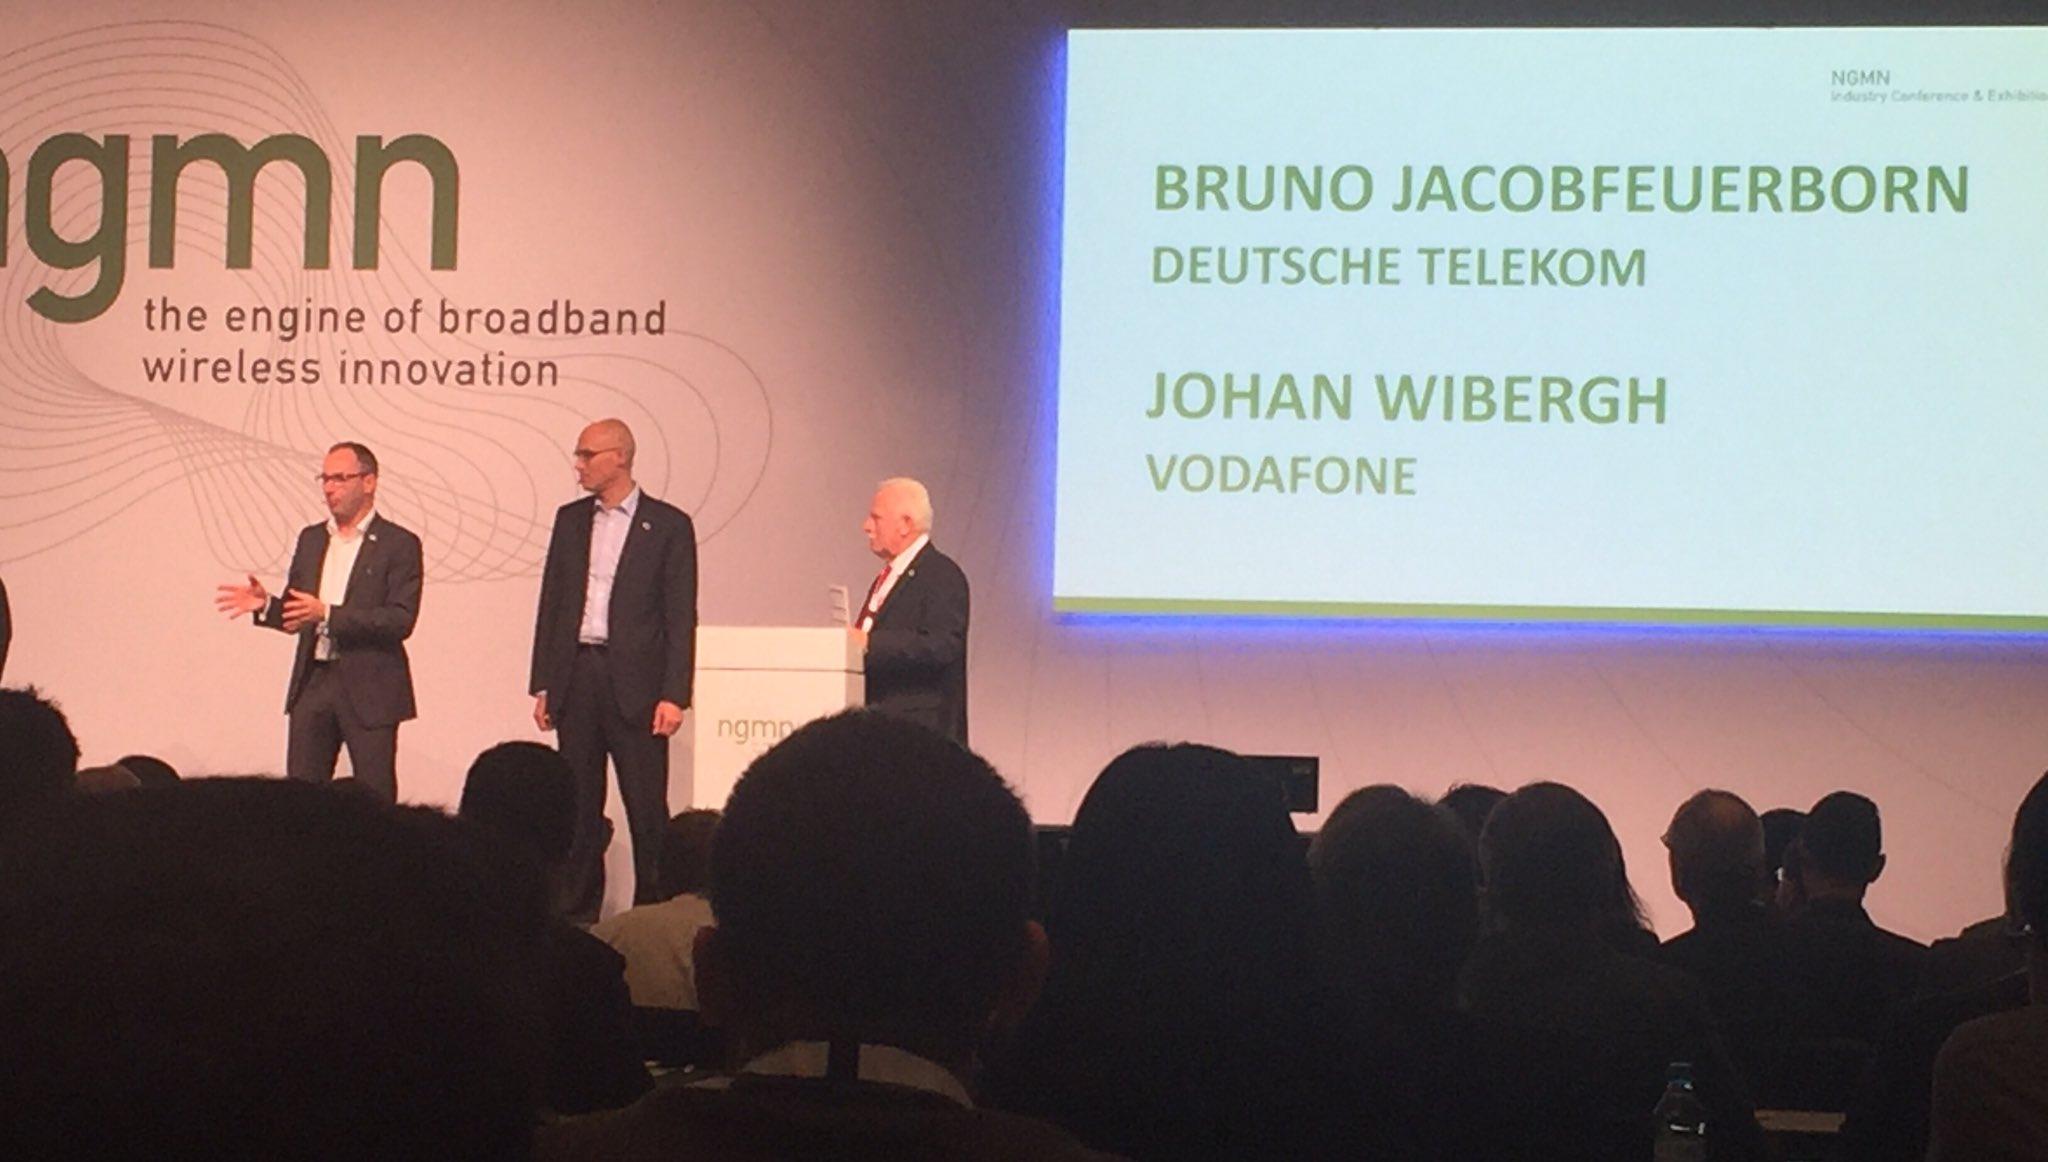 New chairman of NGMN elected: Johan Wibergh, global CTO Vodafone #NGMN_ICE2016 https://t.co/B7EIIgYBCS